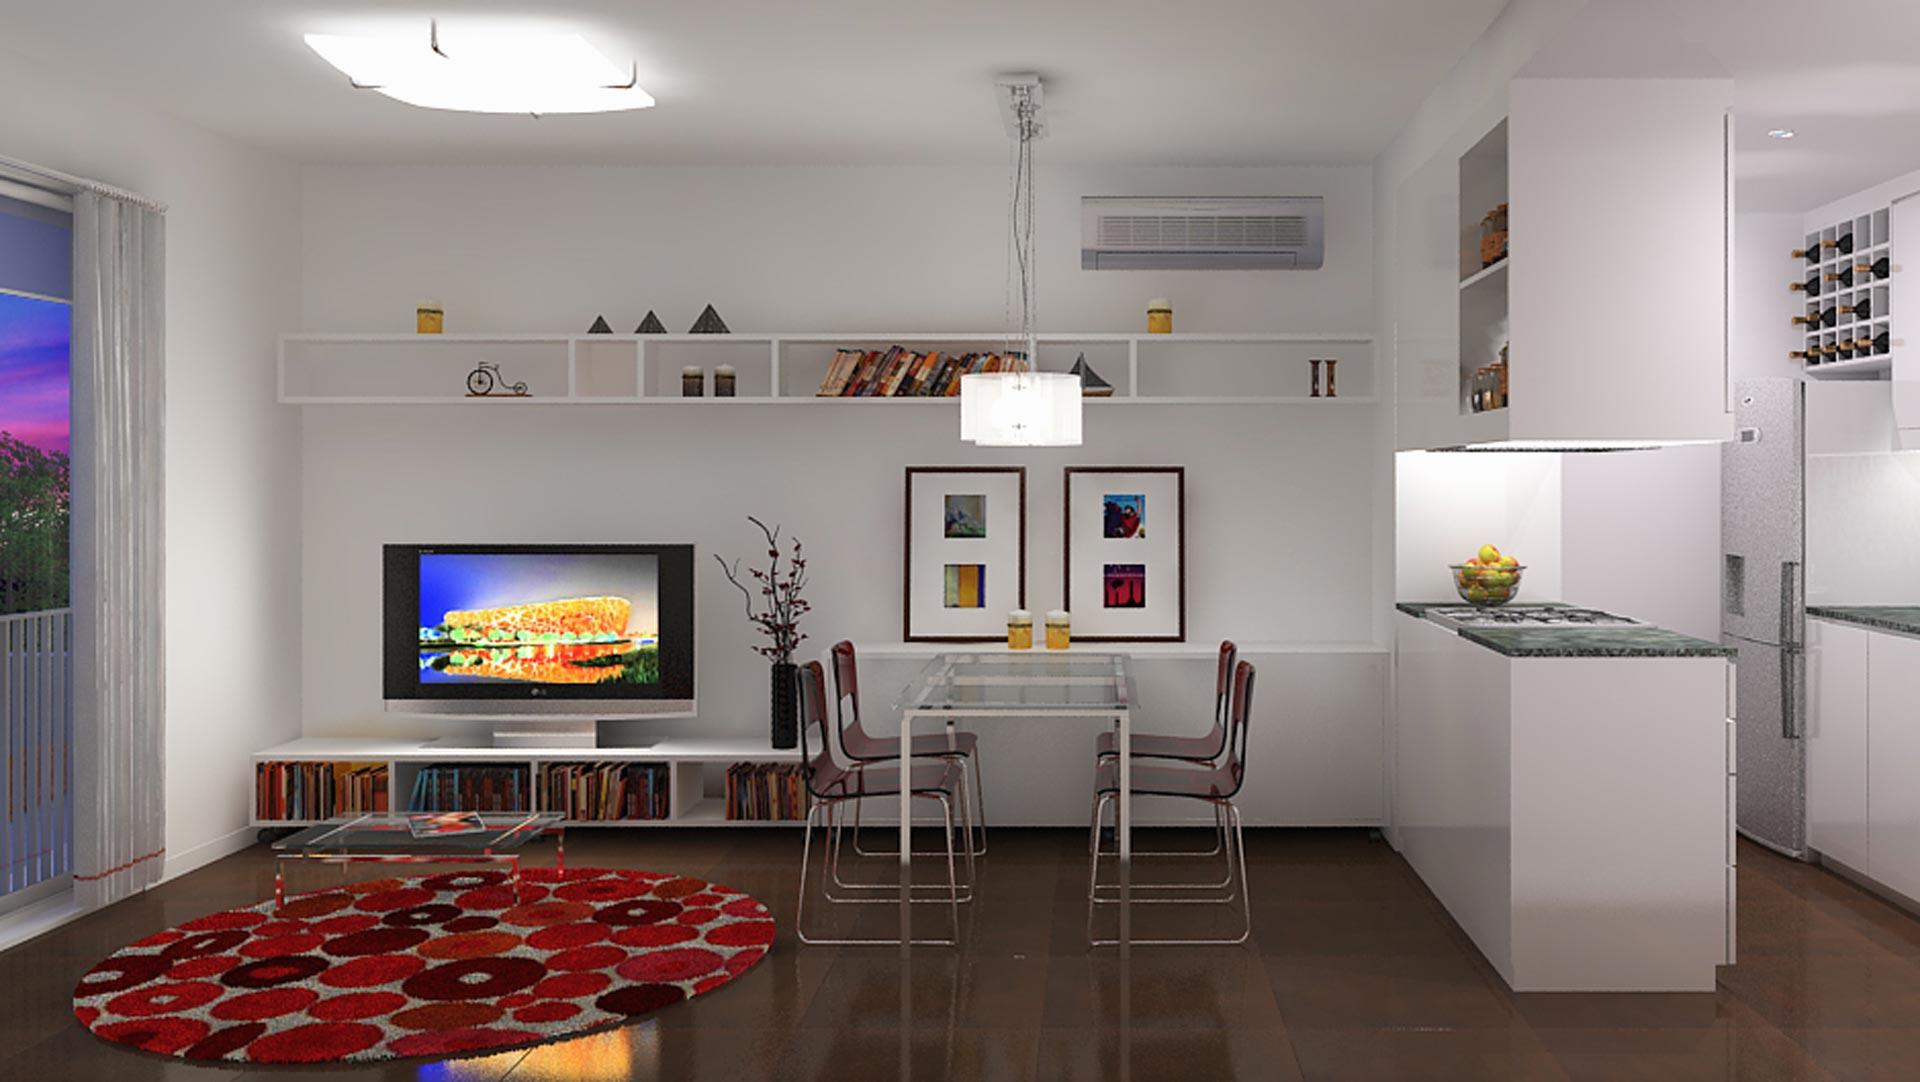 Renders 3D Arquitectura  Renders 208-LARRALDE-Interior-camara-1-noche